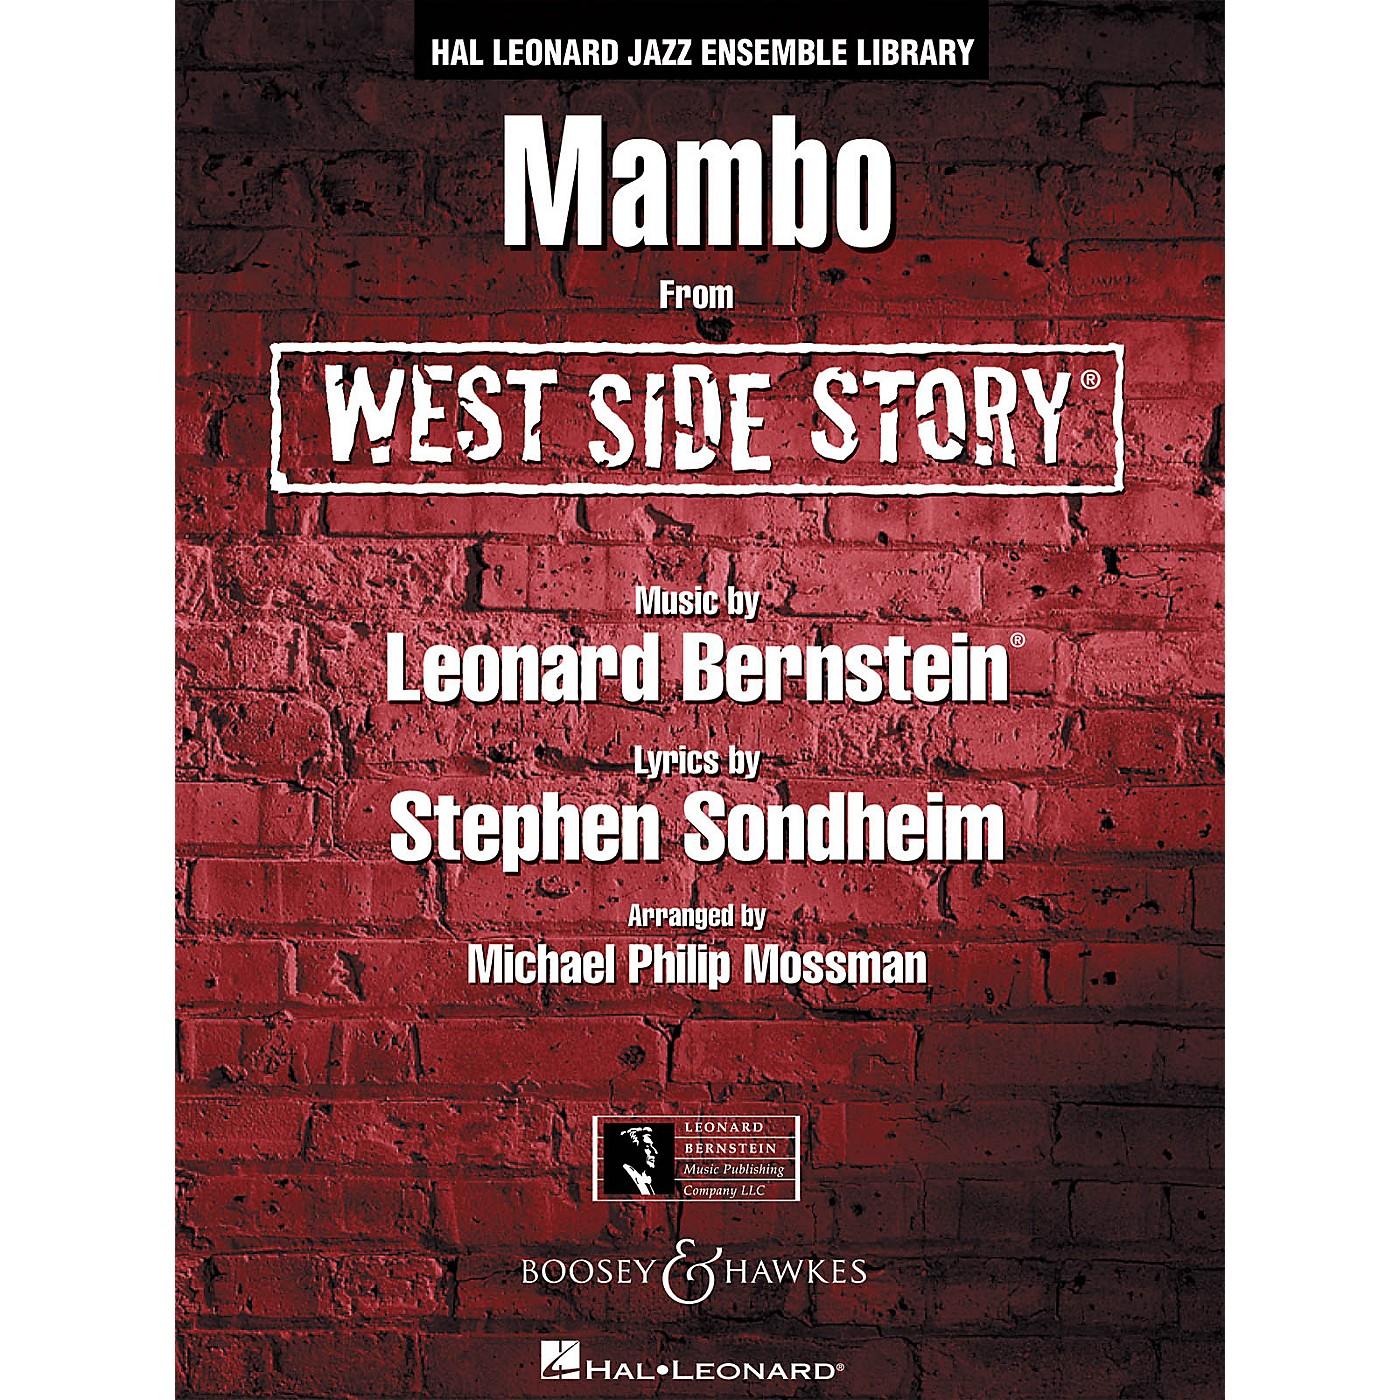 Hal Leonard Mambo (from west Side Story) - Jazz Ensemble Full Score Jazz Band thumbnail